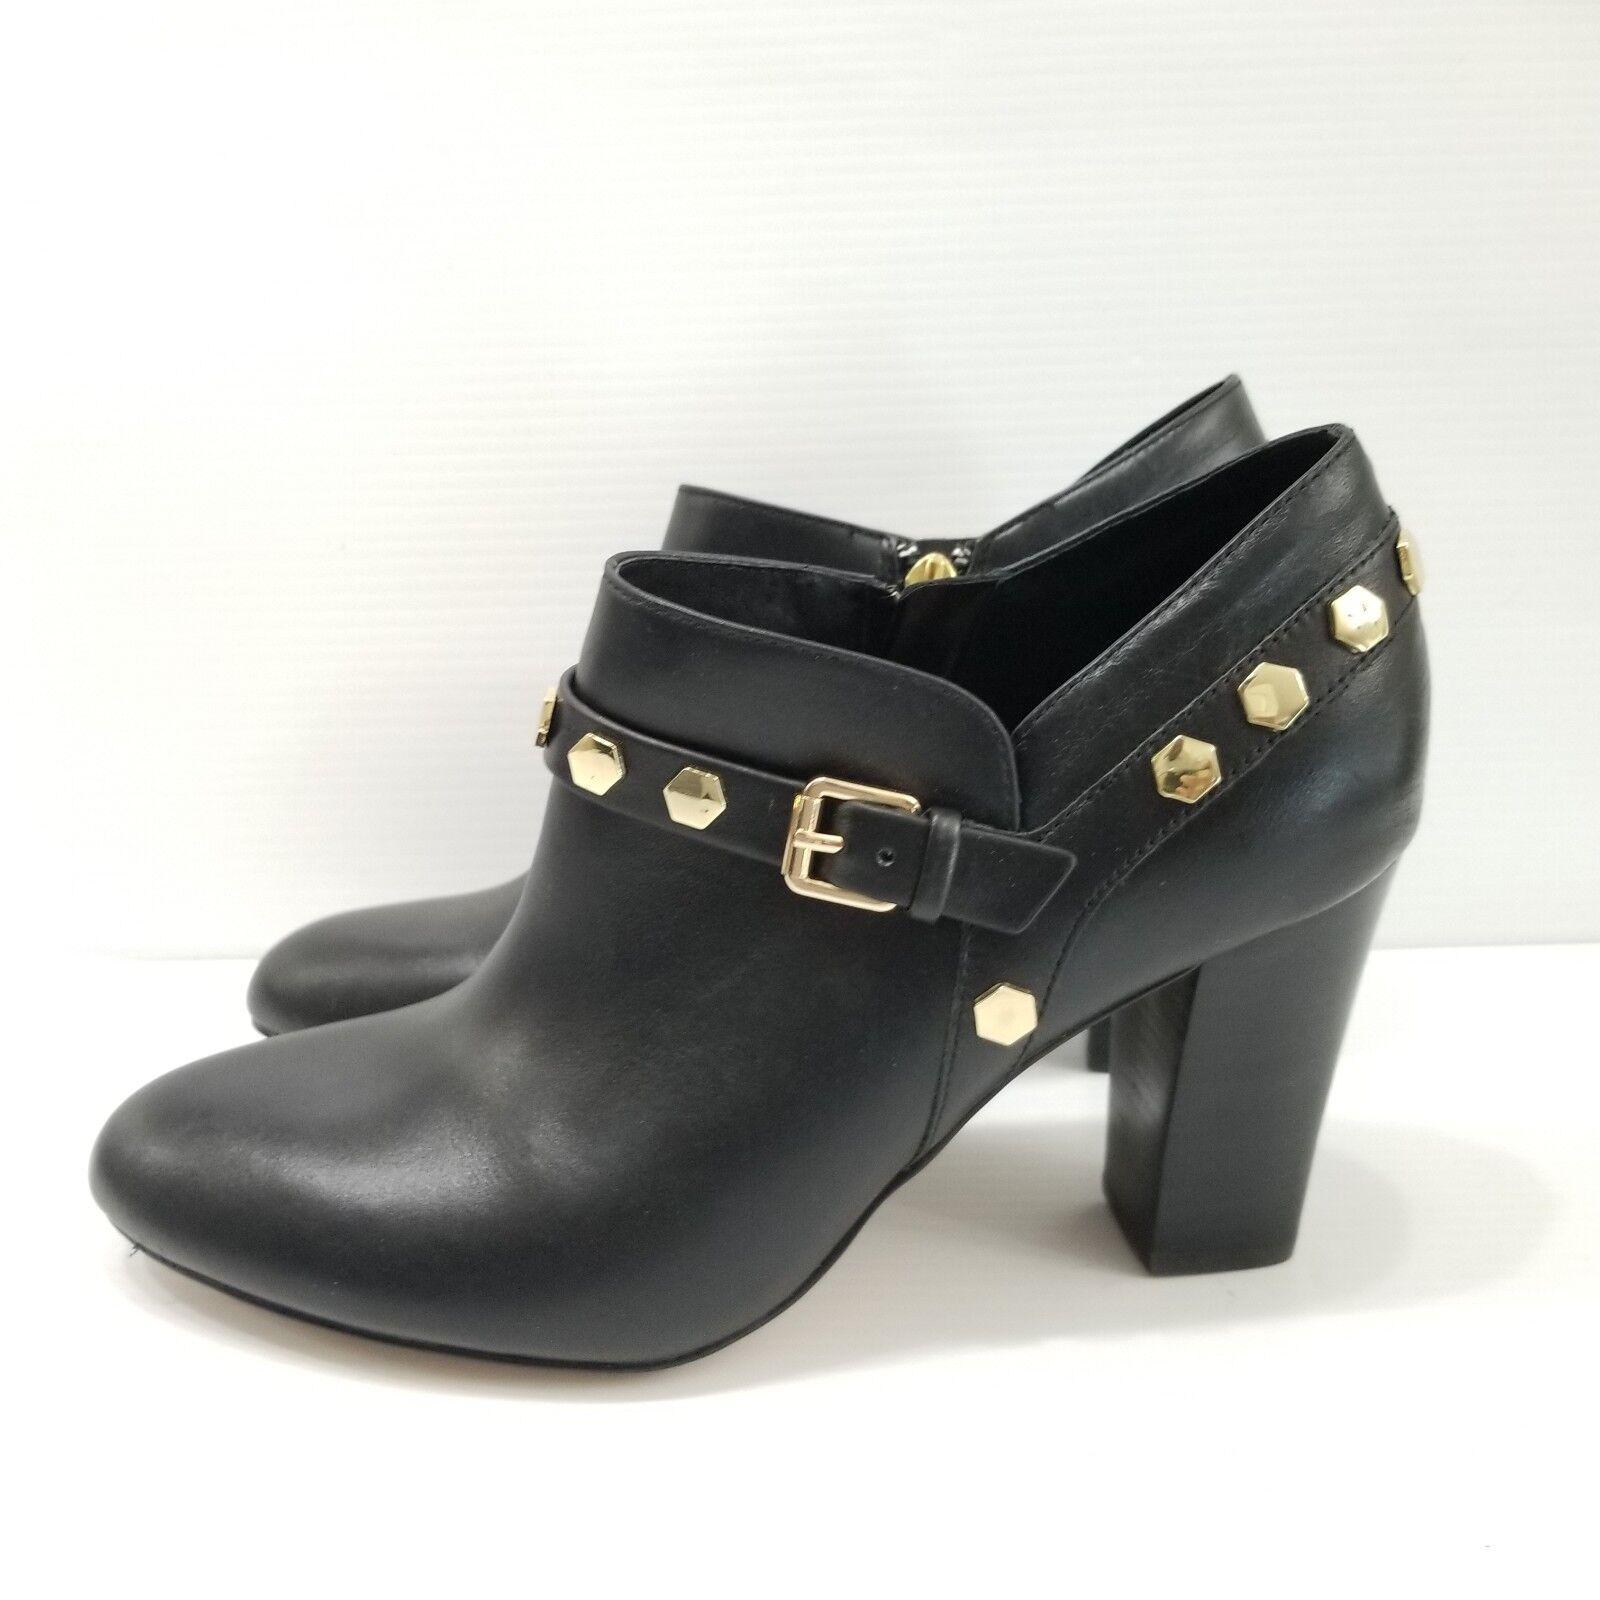 ISOLA Elisha Black Leather Ankle Boots gold Studded Heels 9.5 M